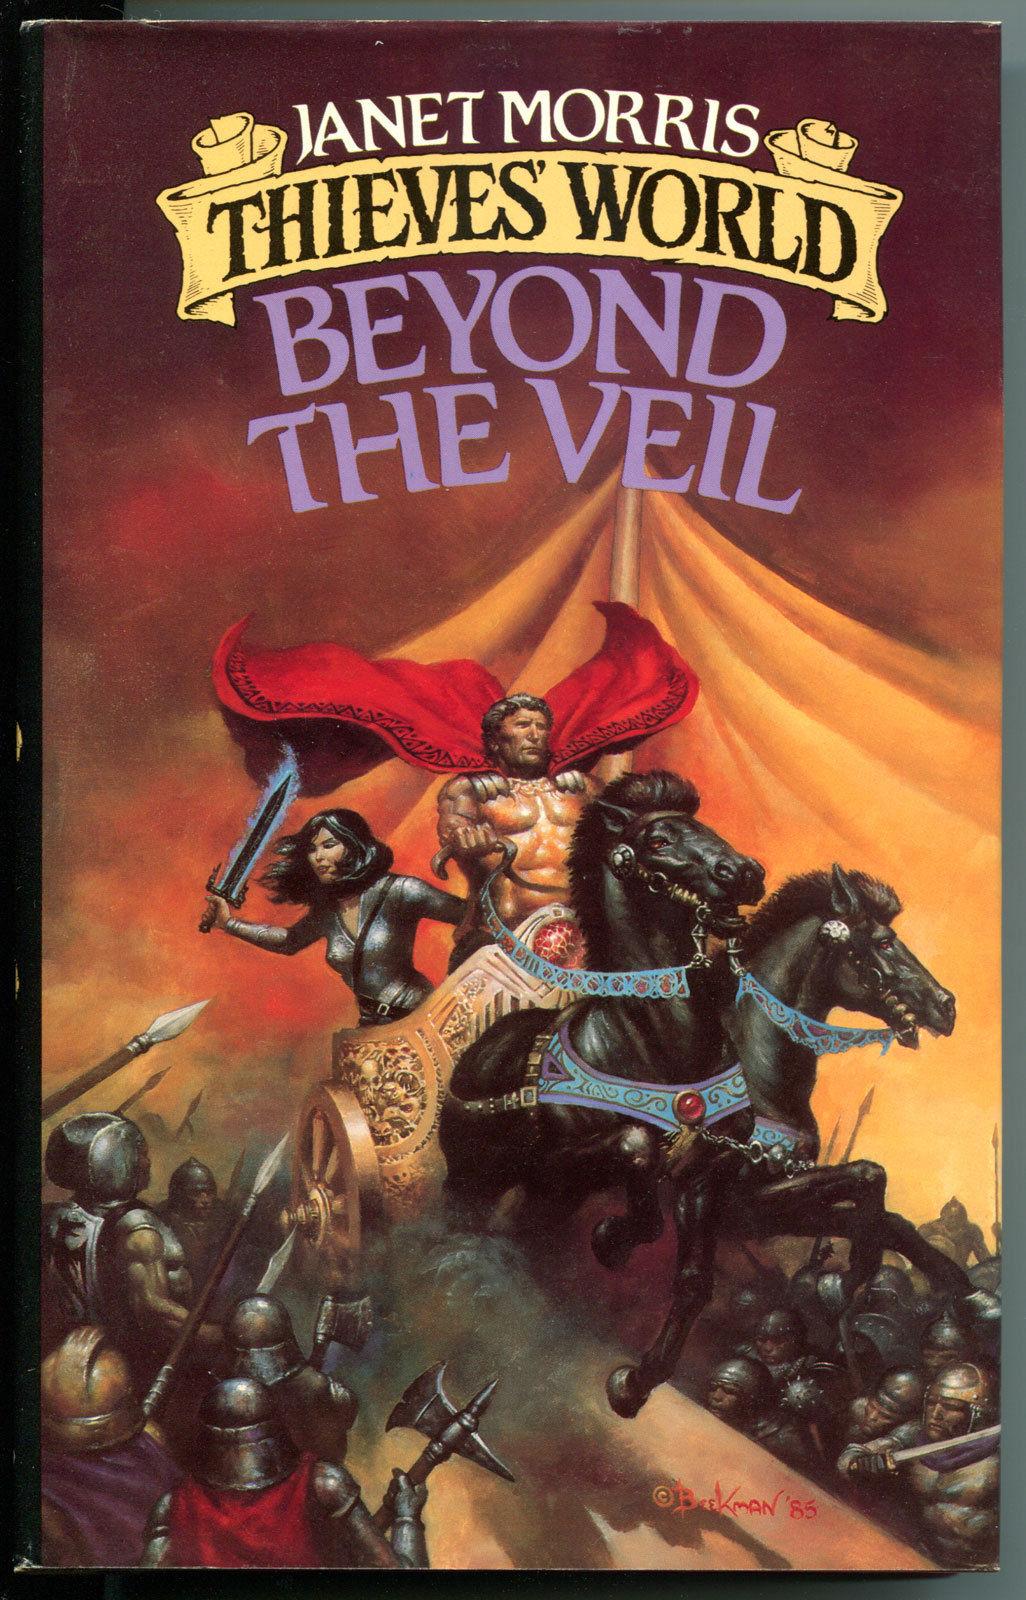 BEYOND the VEIL, HC/DJ, Janet Morris, 1st, 1985, FN/VG+, unread, Thieve's World